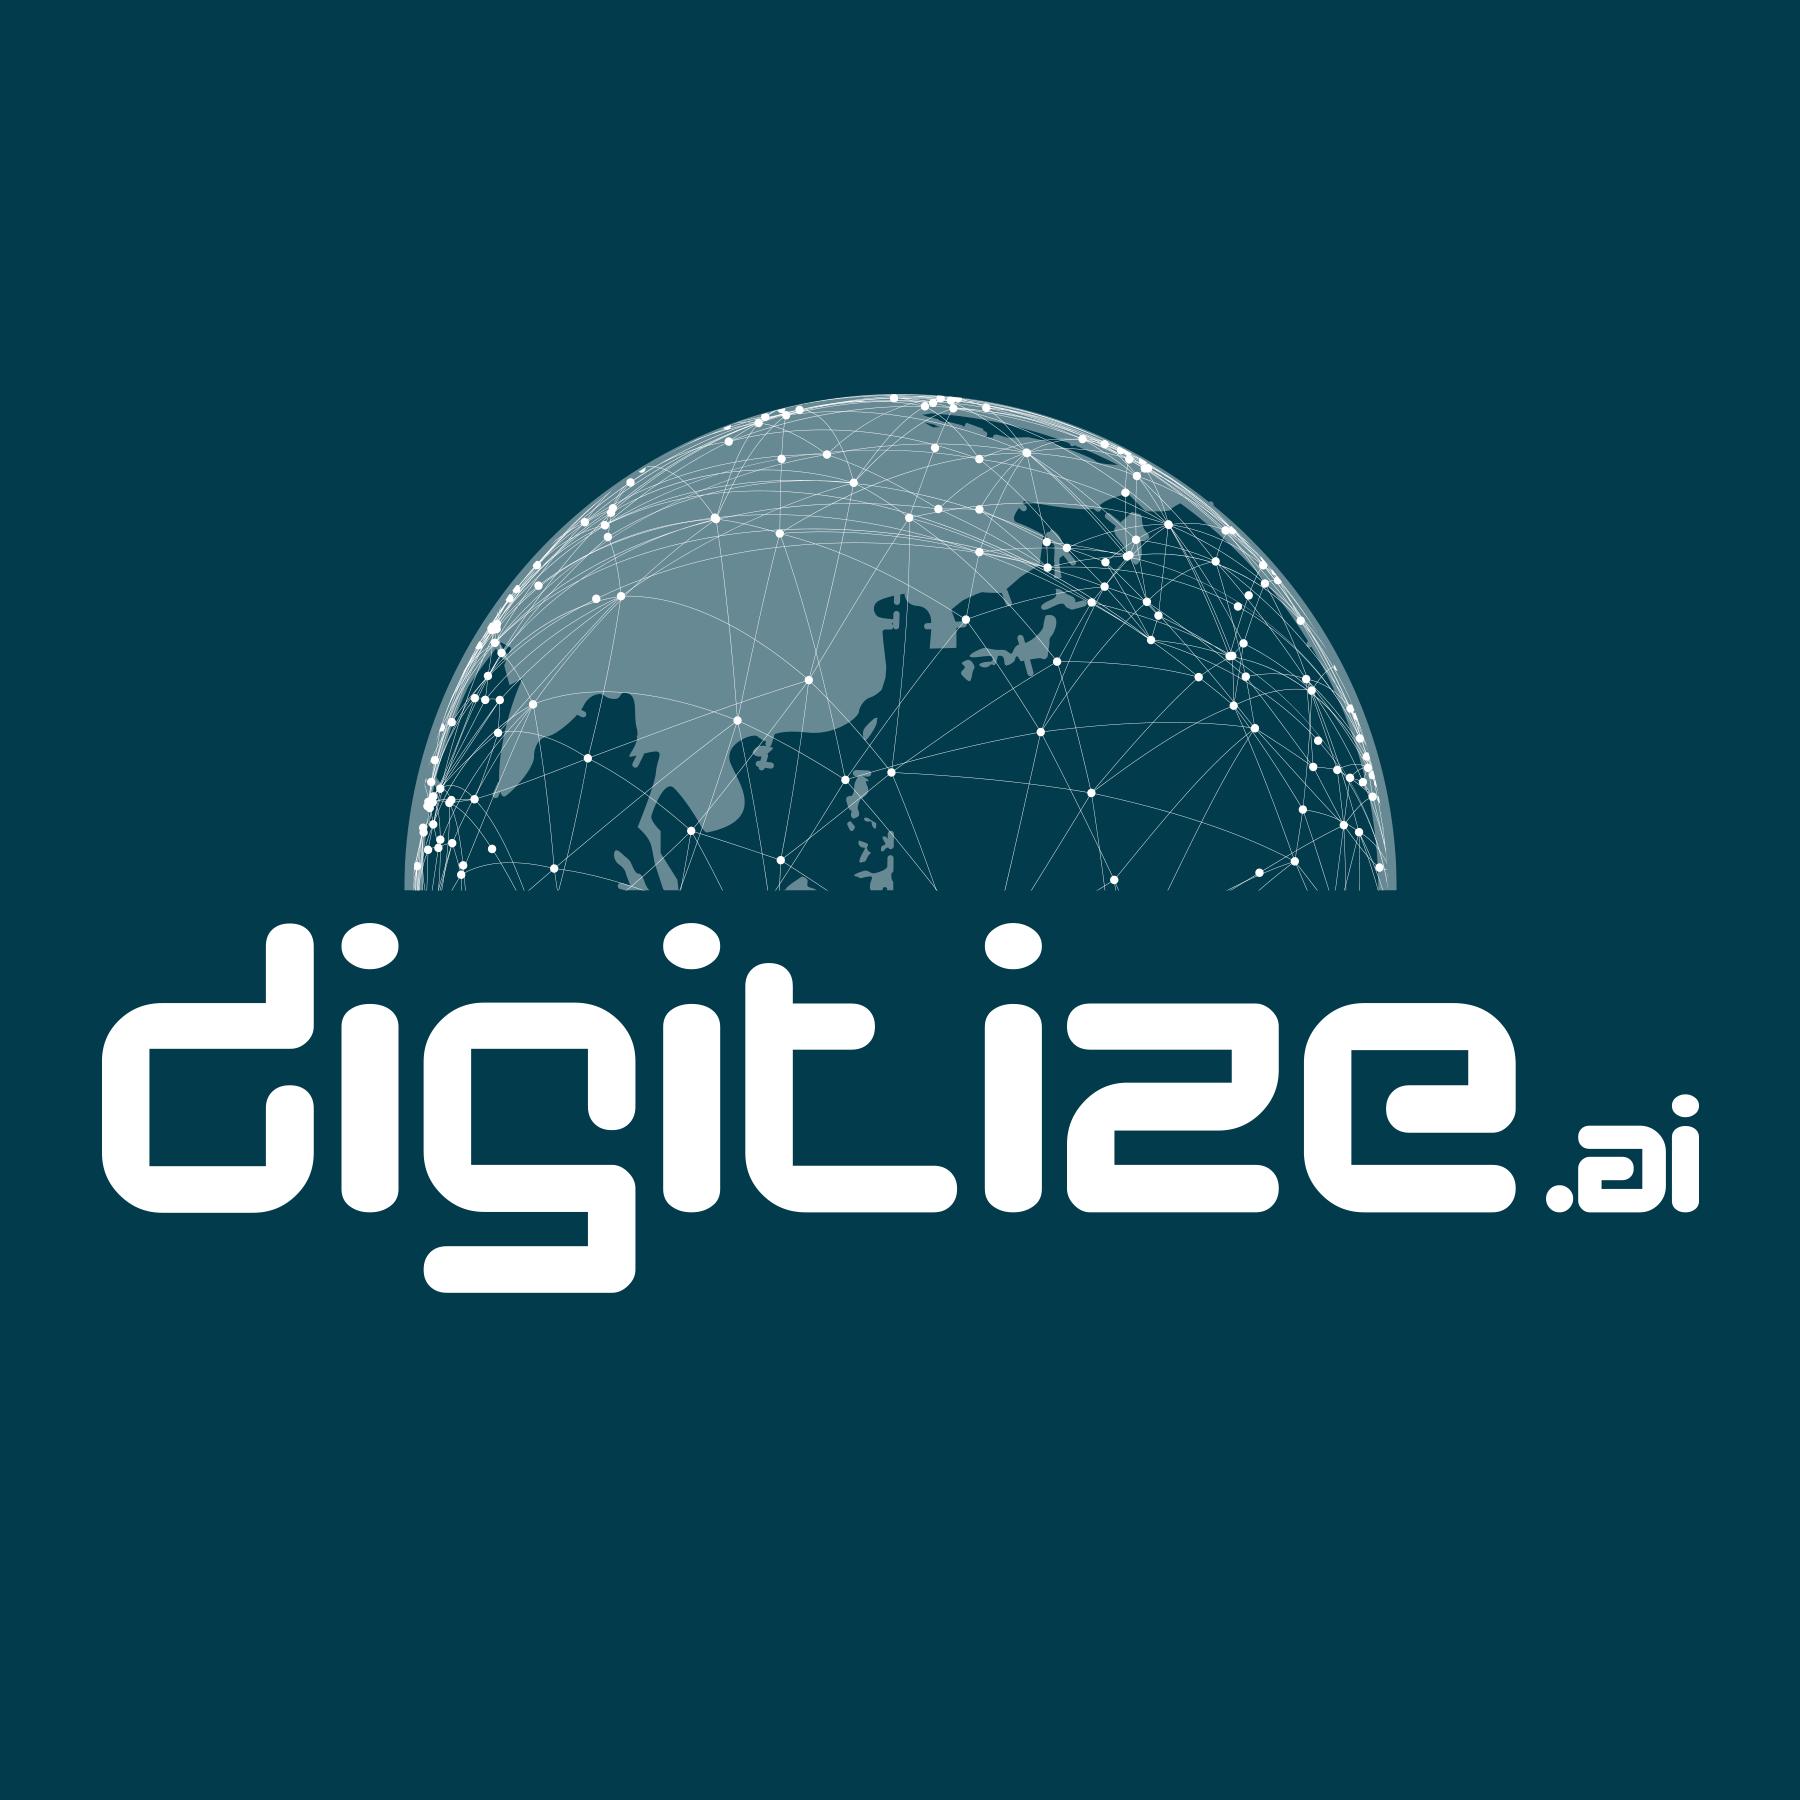 Digitize.AI